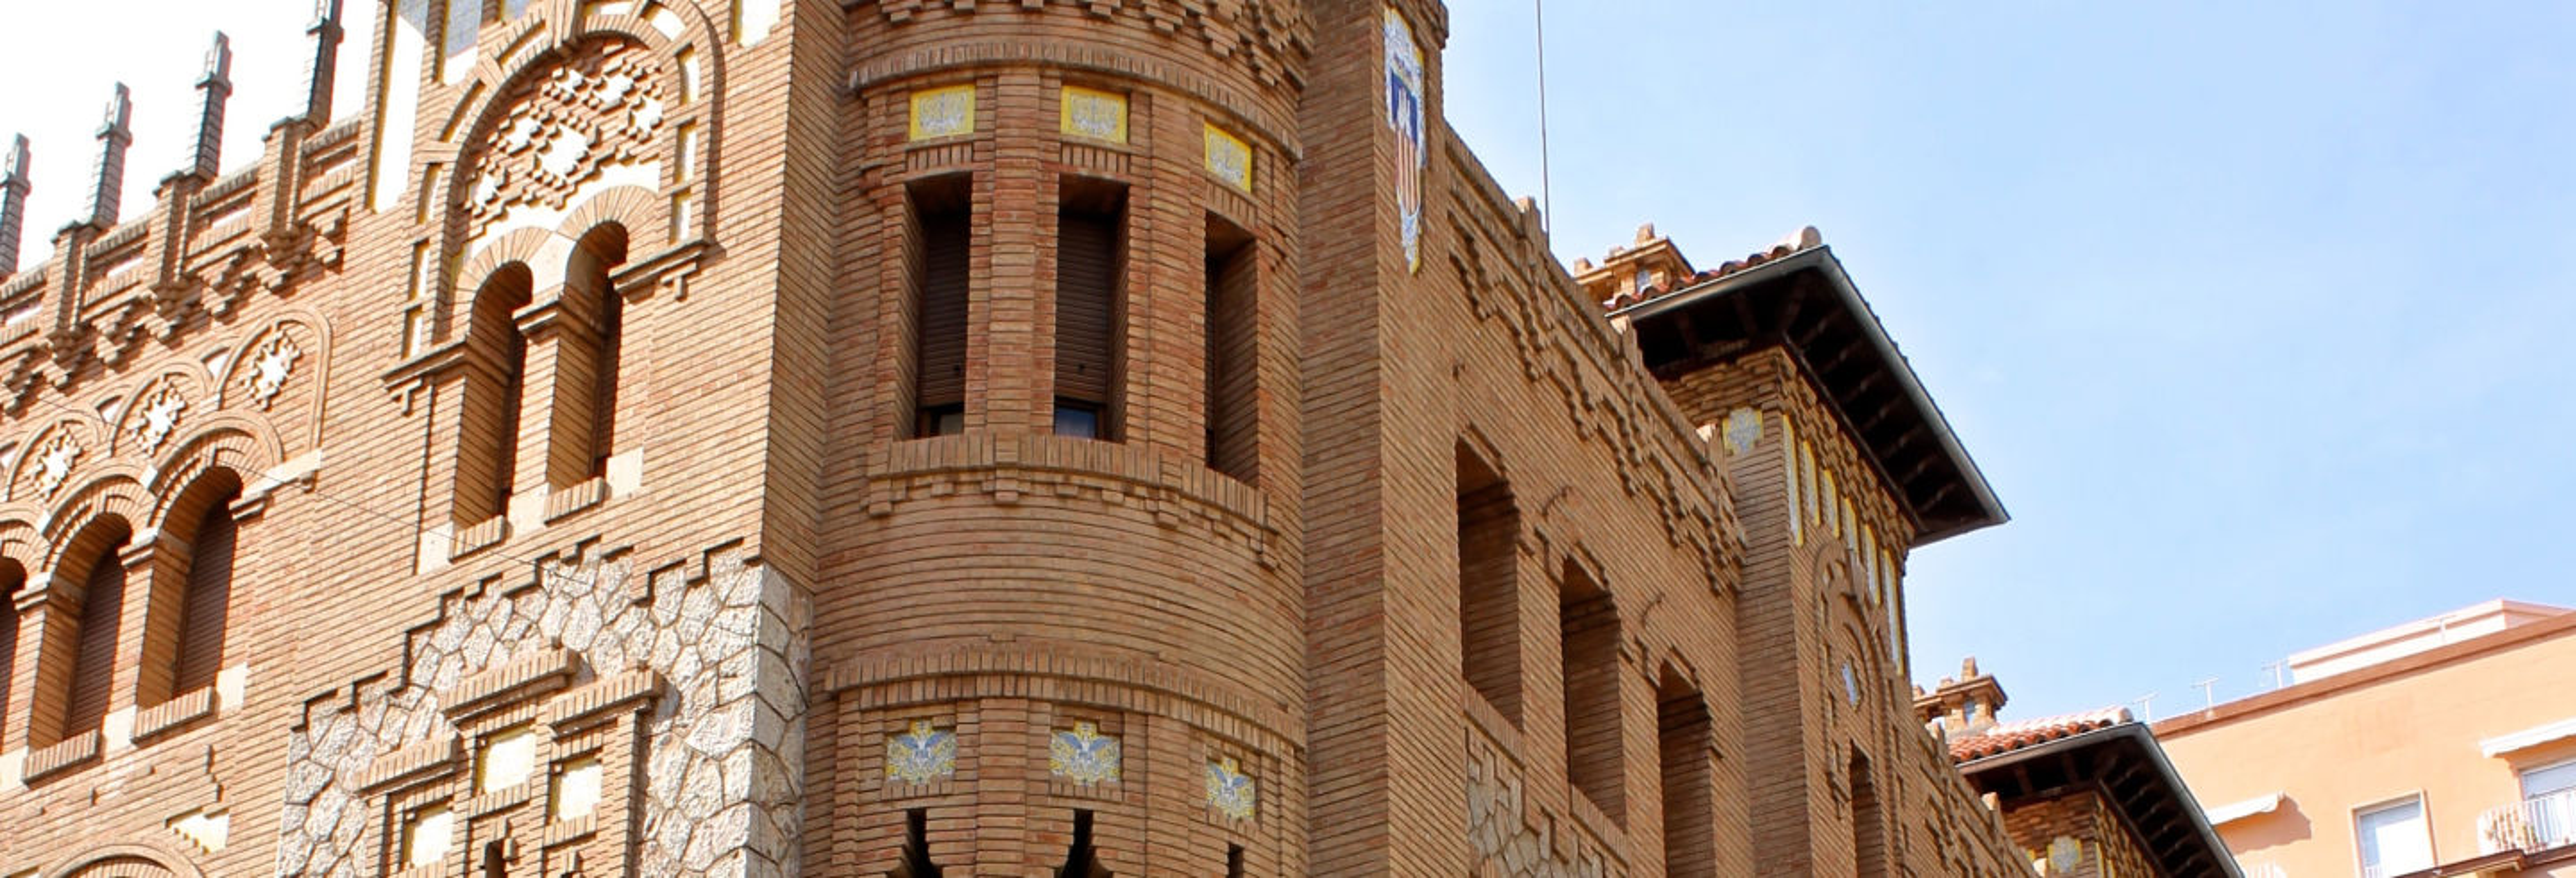 Tour privado por Castellón de la Plana ¡Tú eliges!